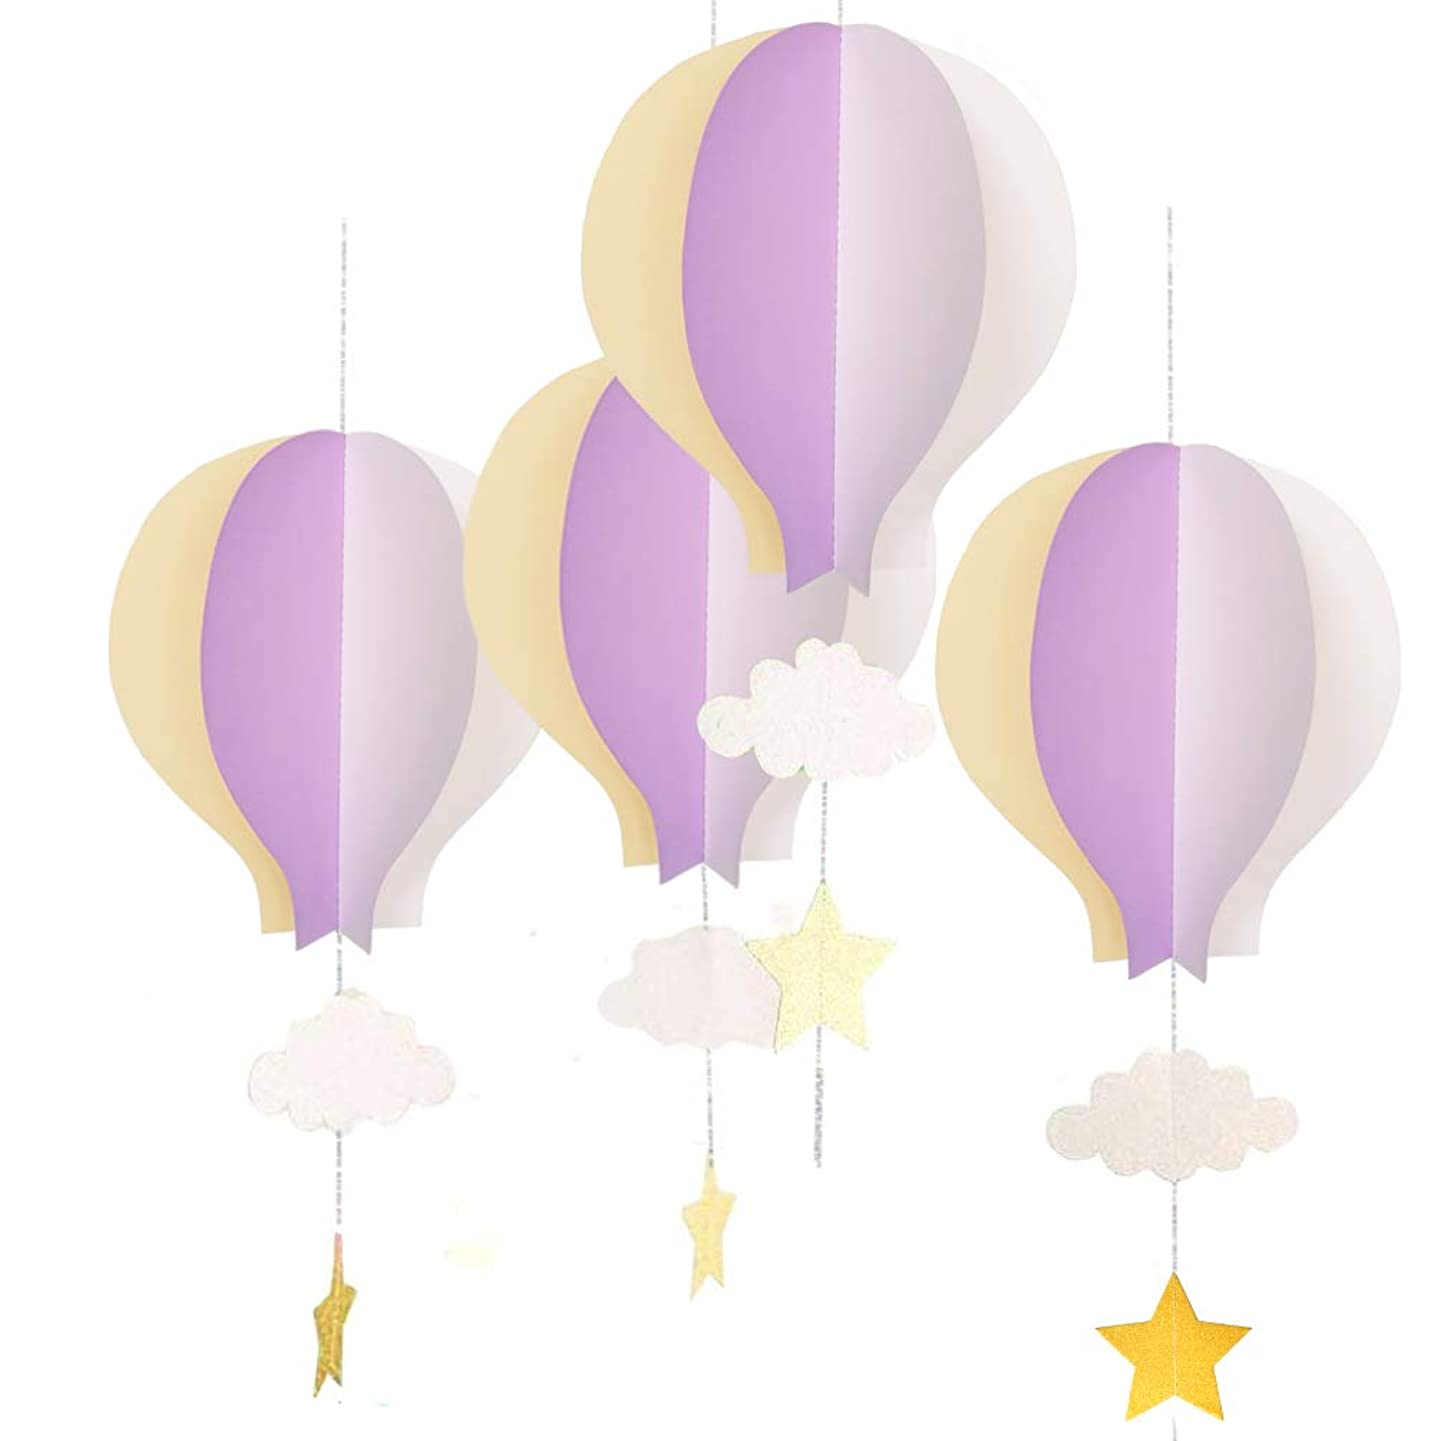 AZOWA 8 Pcs Big Hot Air Balloon Decorations Purple for Baby Shower